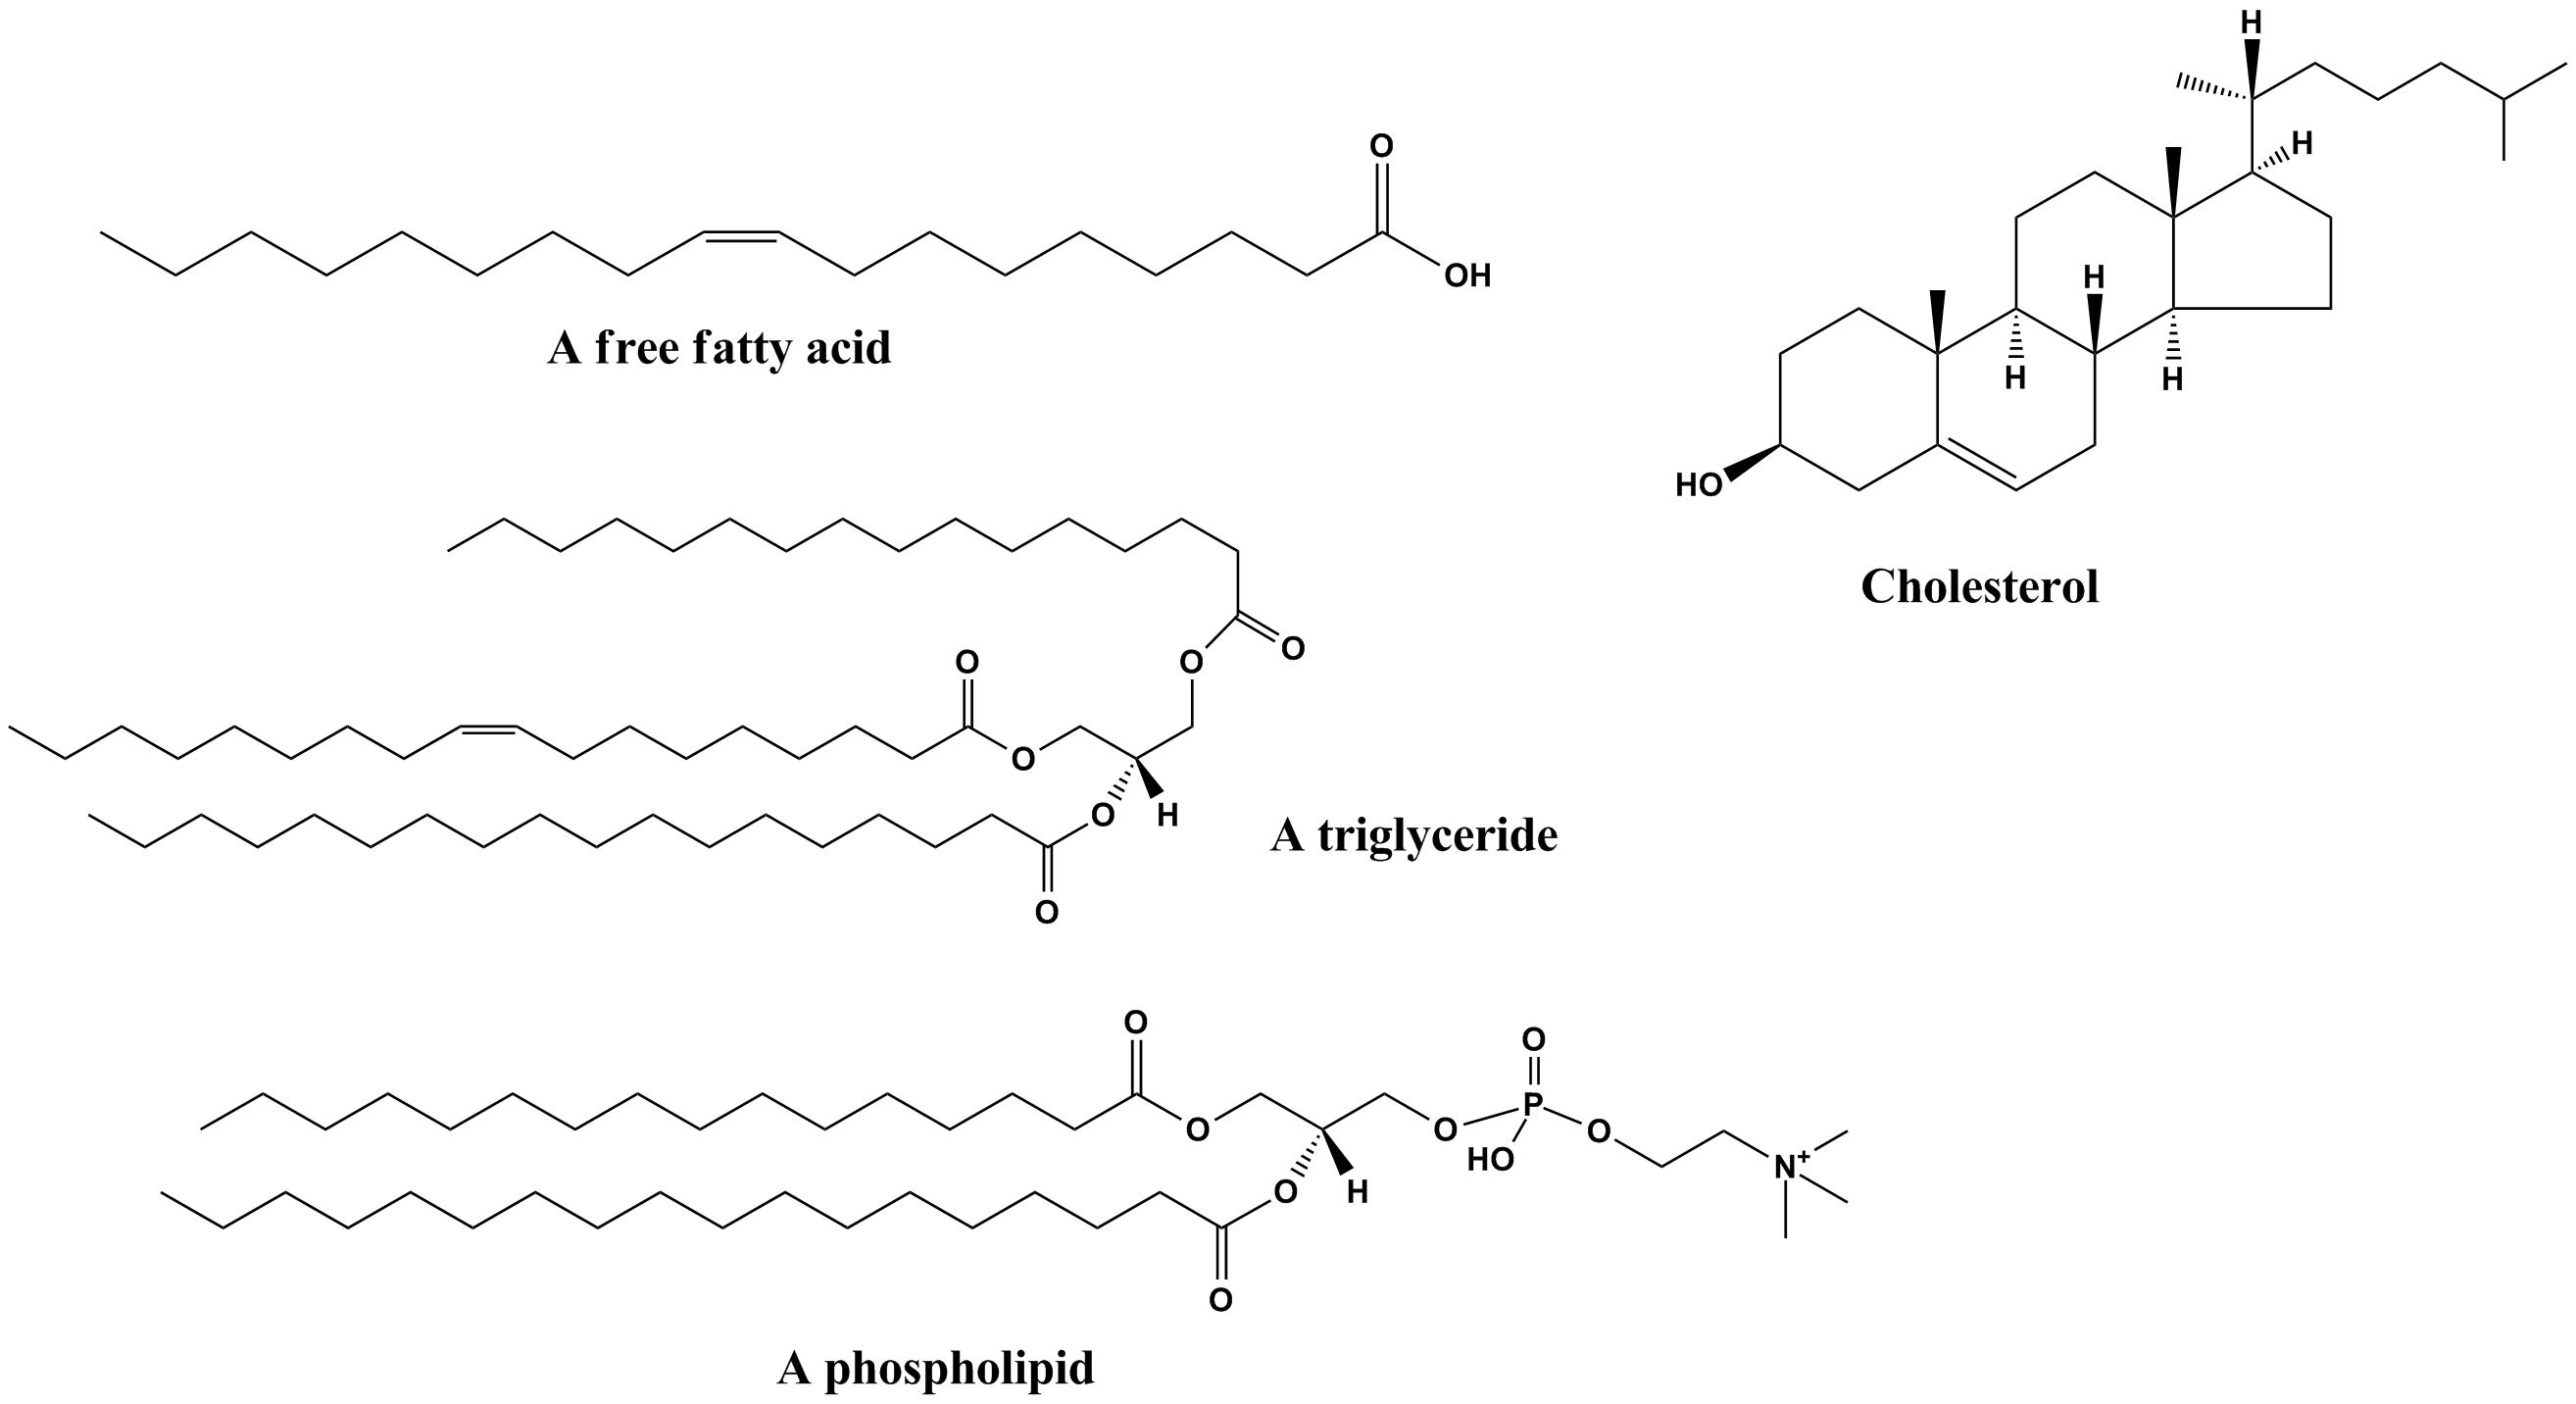 (http://oakridgeapbio.pbworks.com/f/1243342251/Common_lipids_lmaps.png)